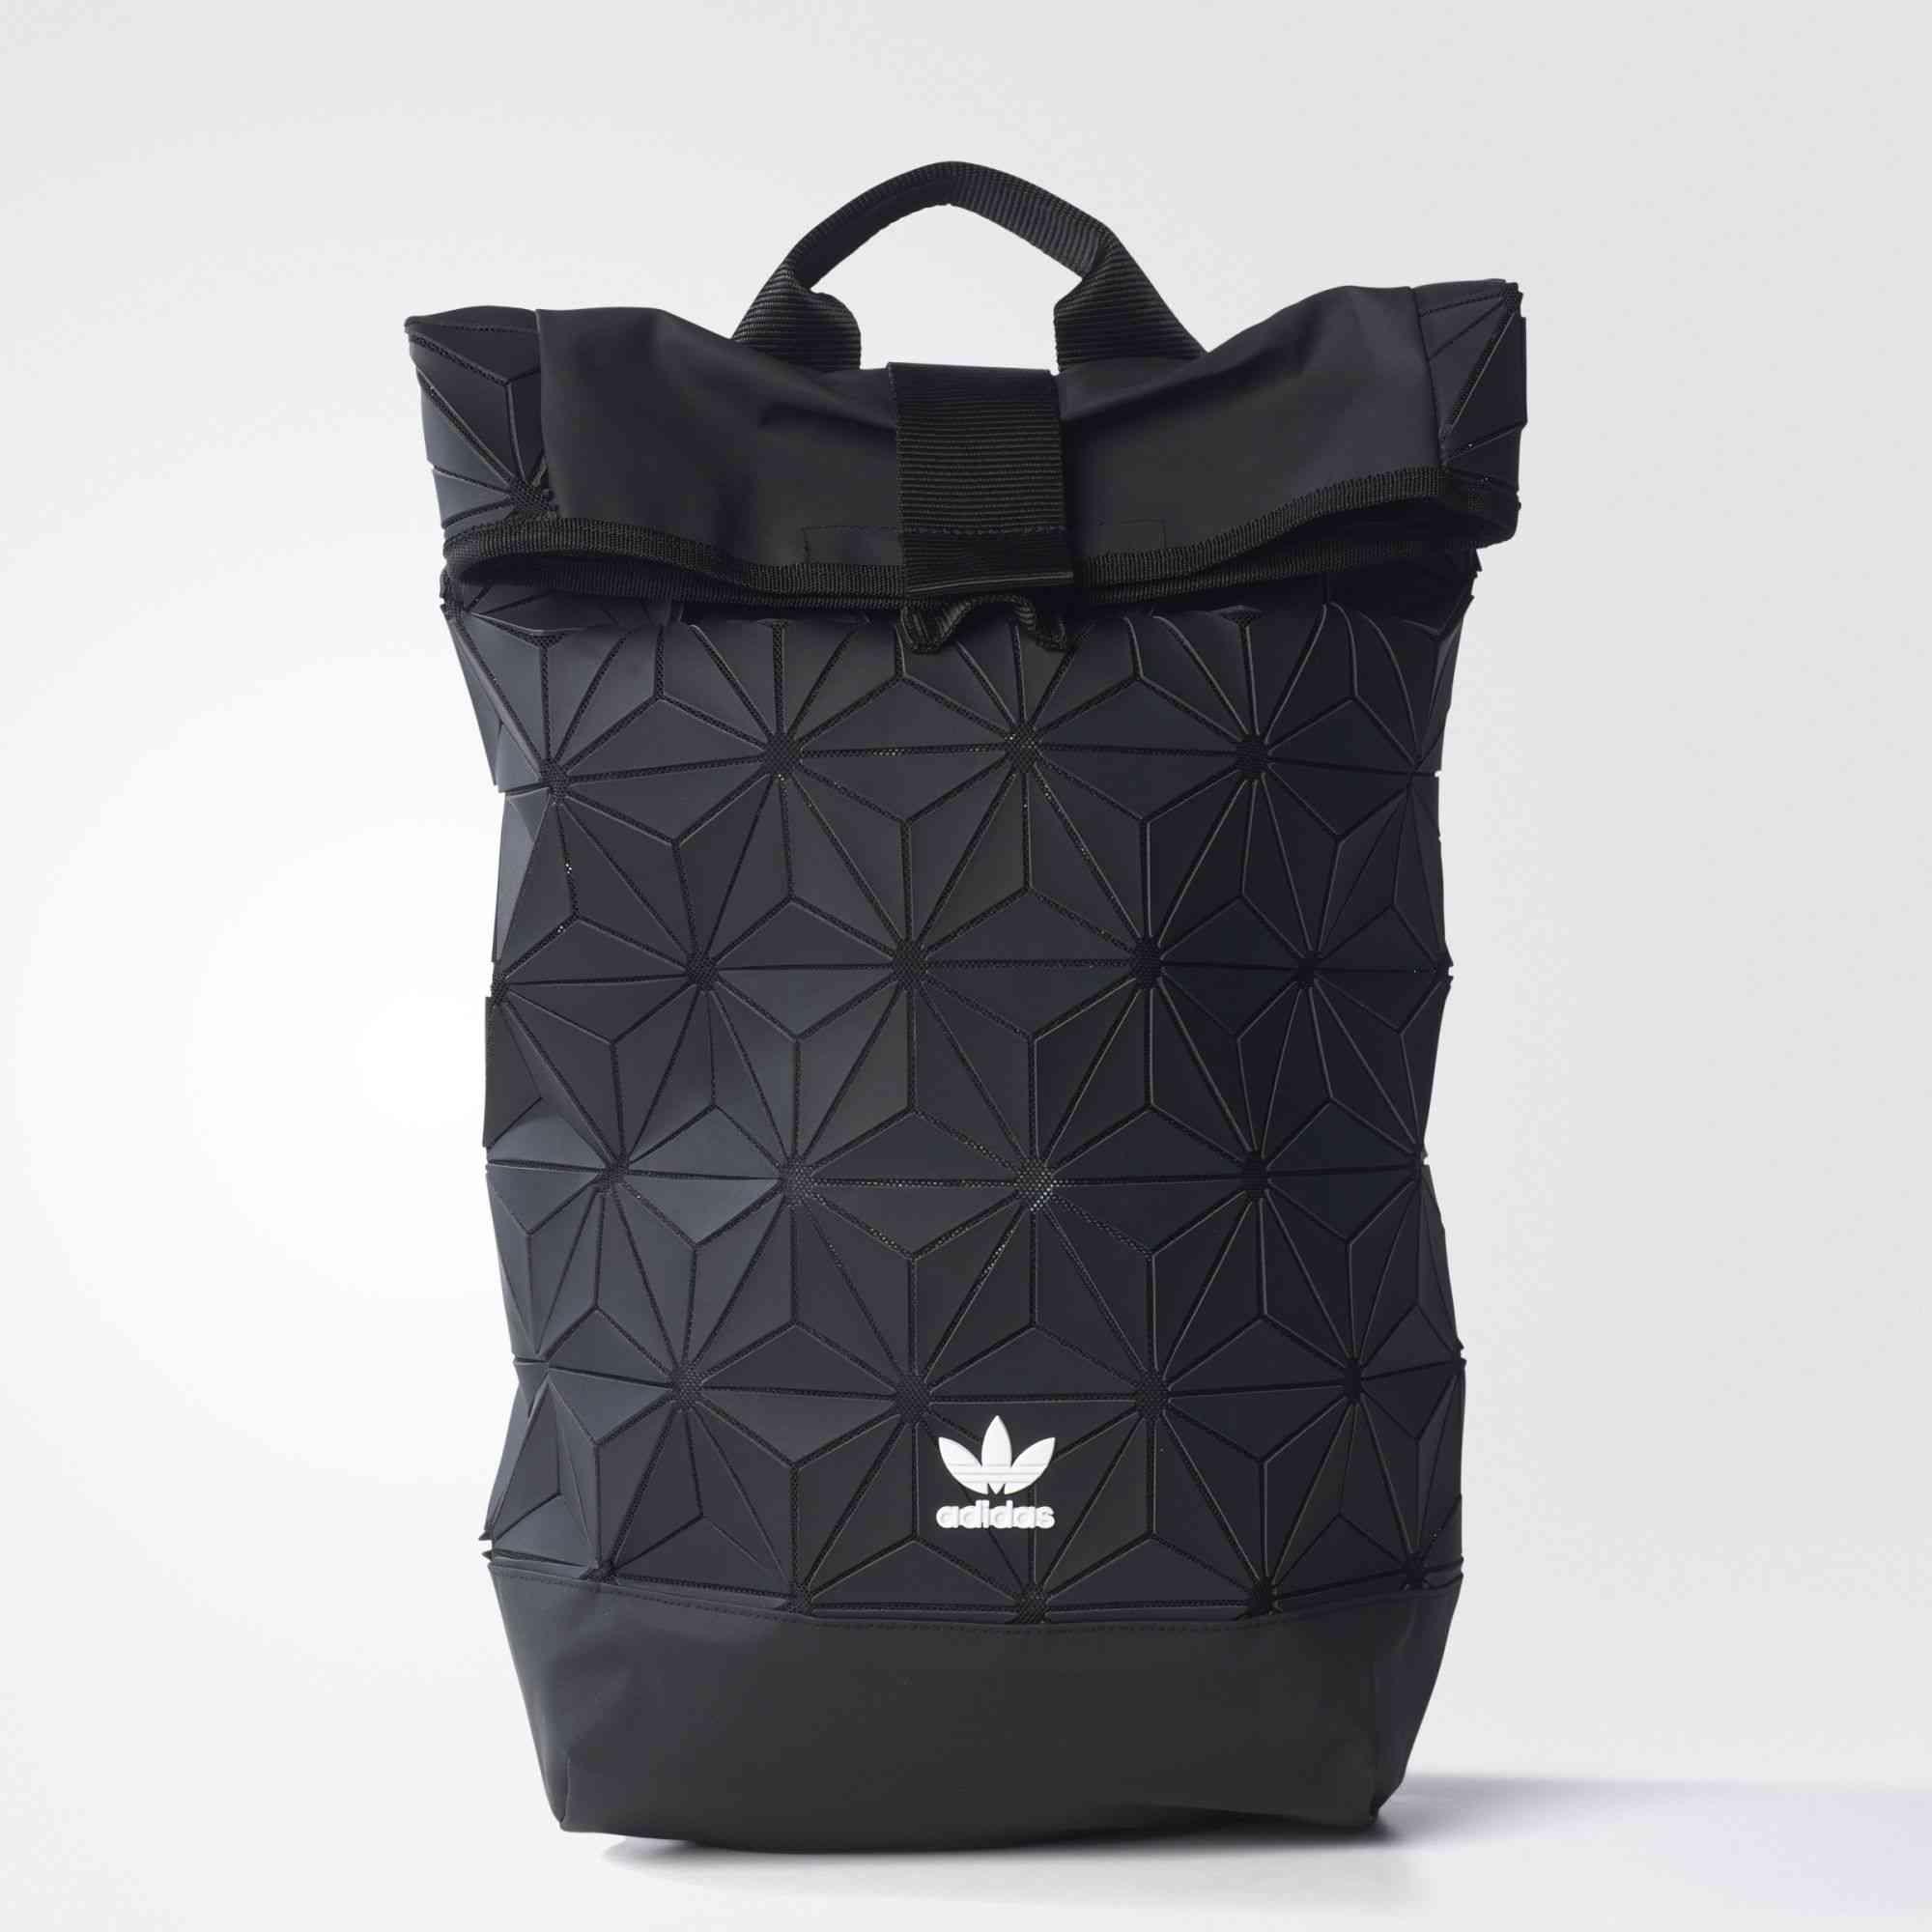 Buy buy adidas backpack   OFF79% Discounted b93dcd788ba1a